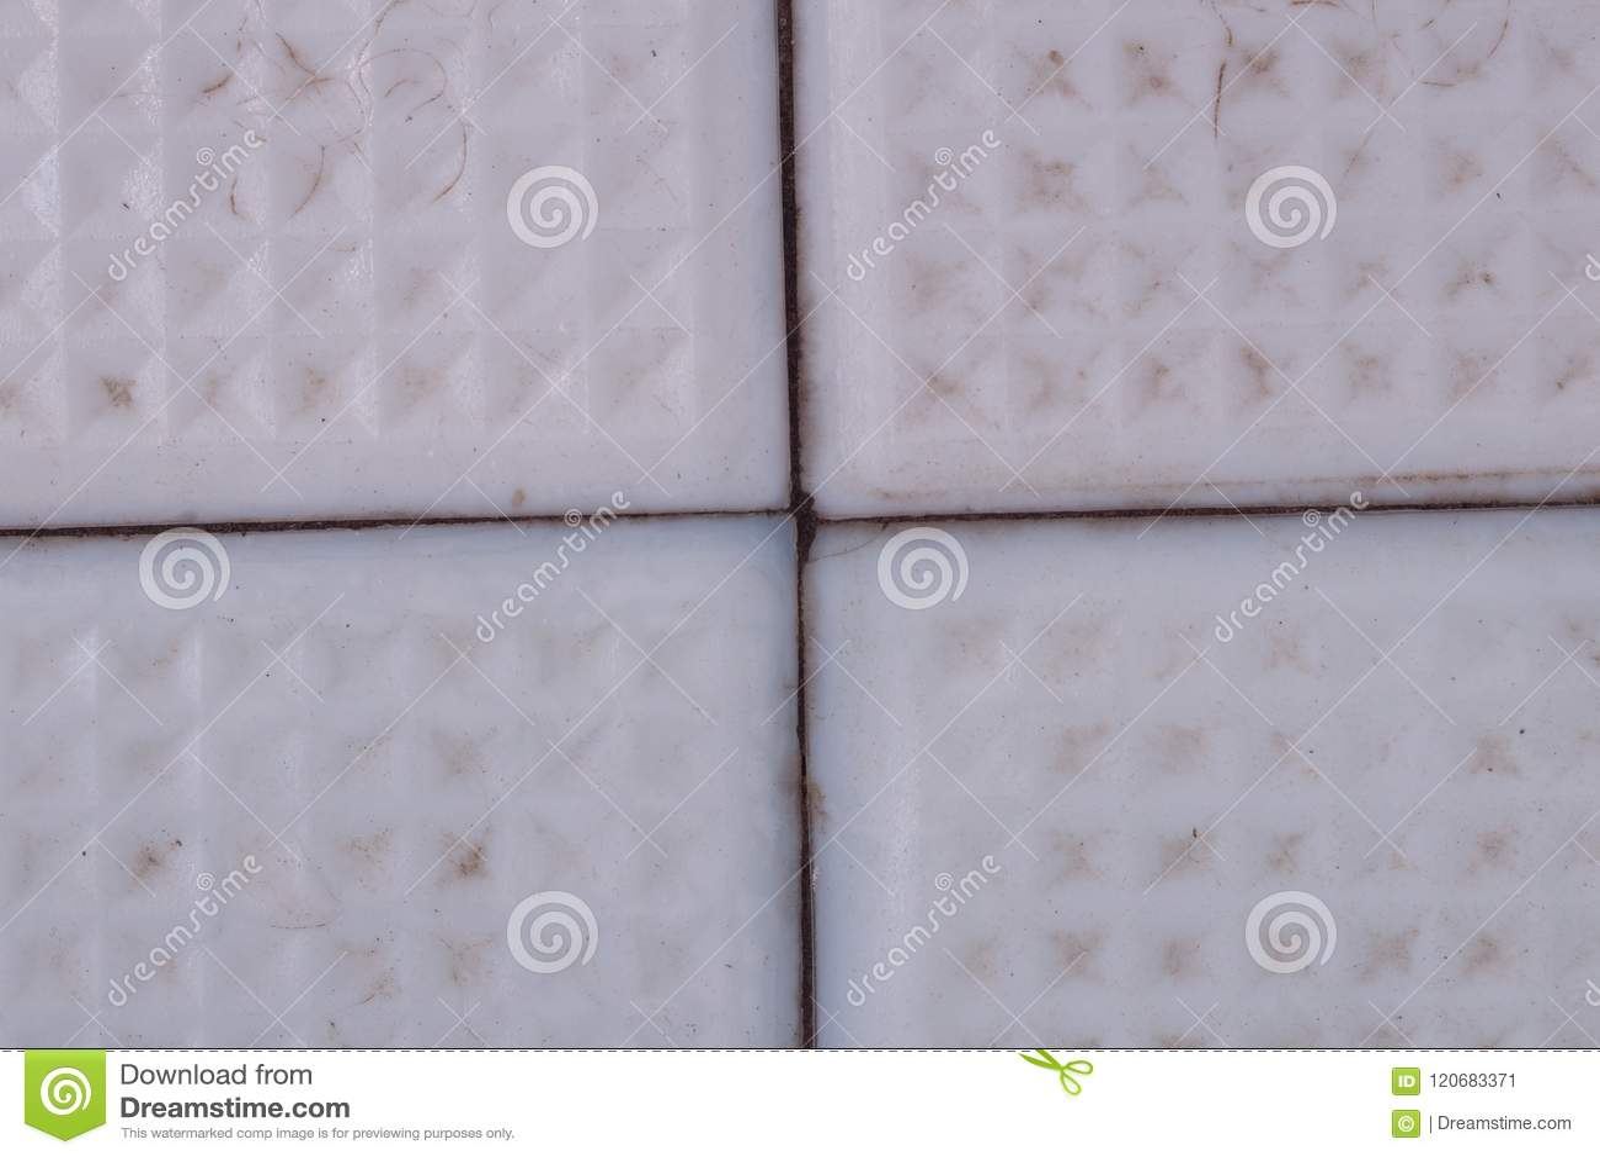 Old Ceramic Tiles Mold Unhygienic Stock Image Image Of Damage